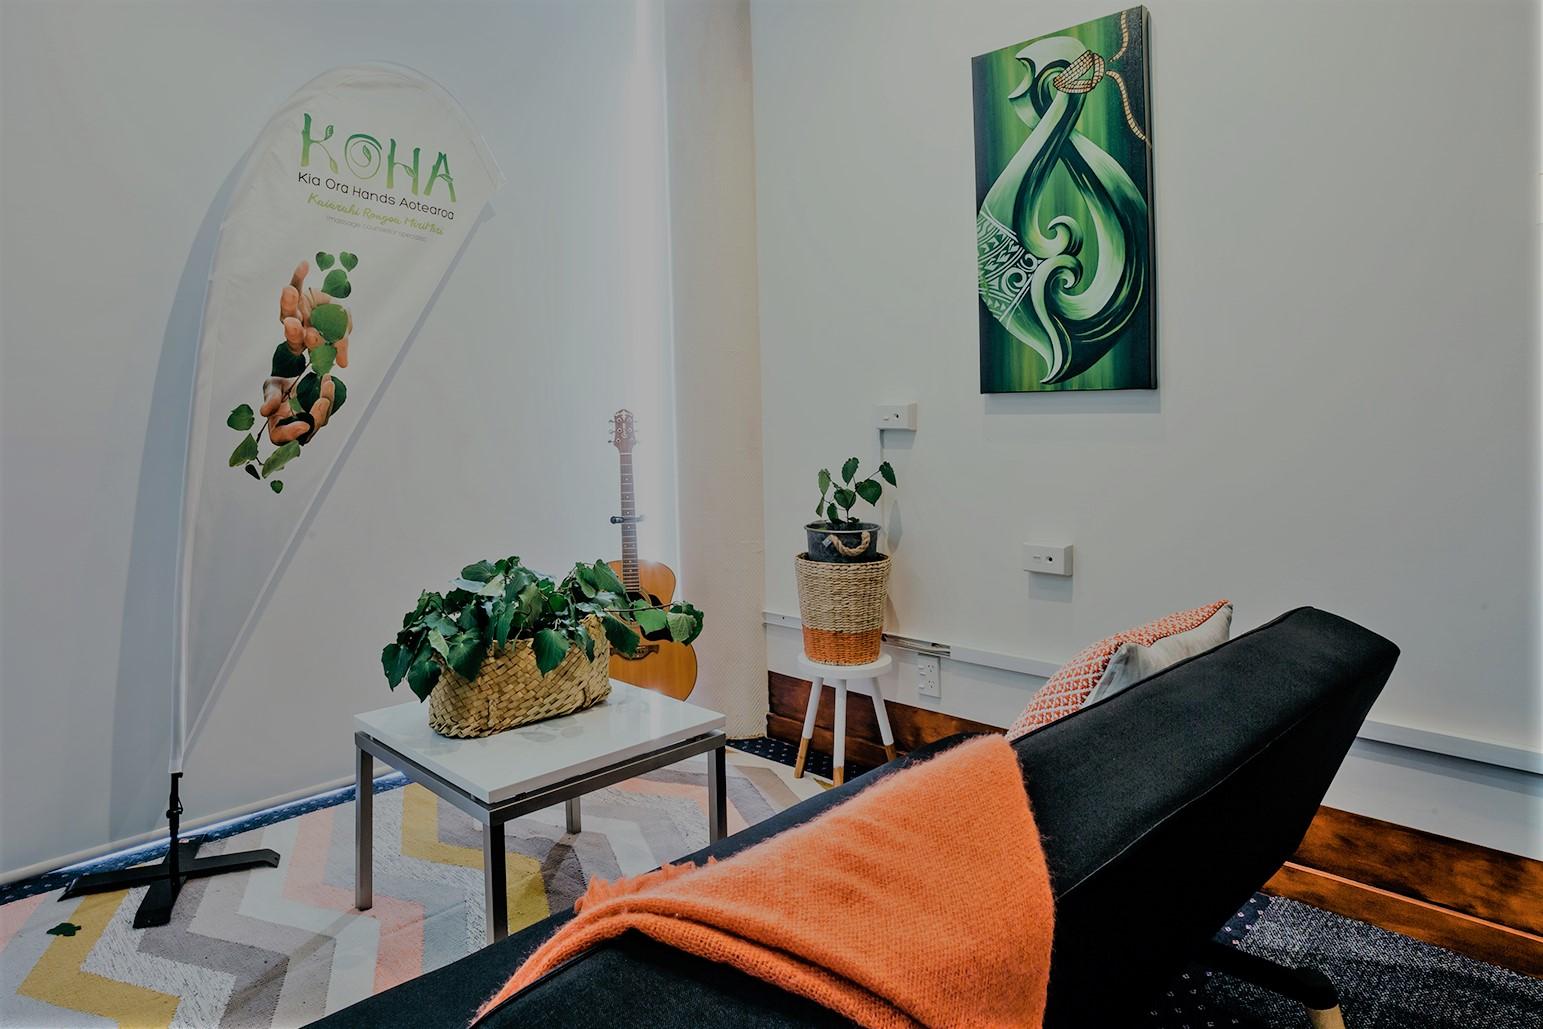 KohaClinic-clinic-9 (2).jpg